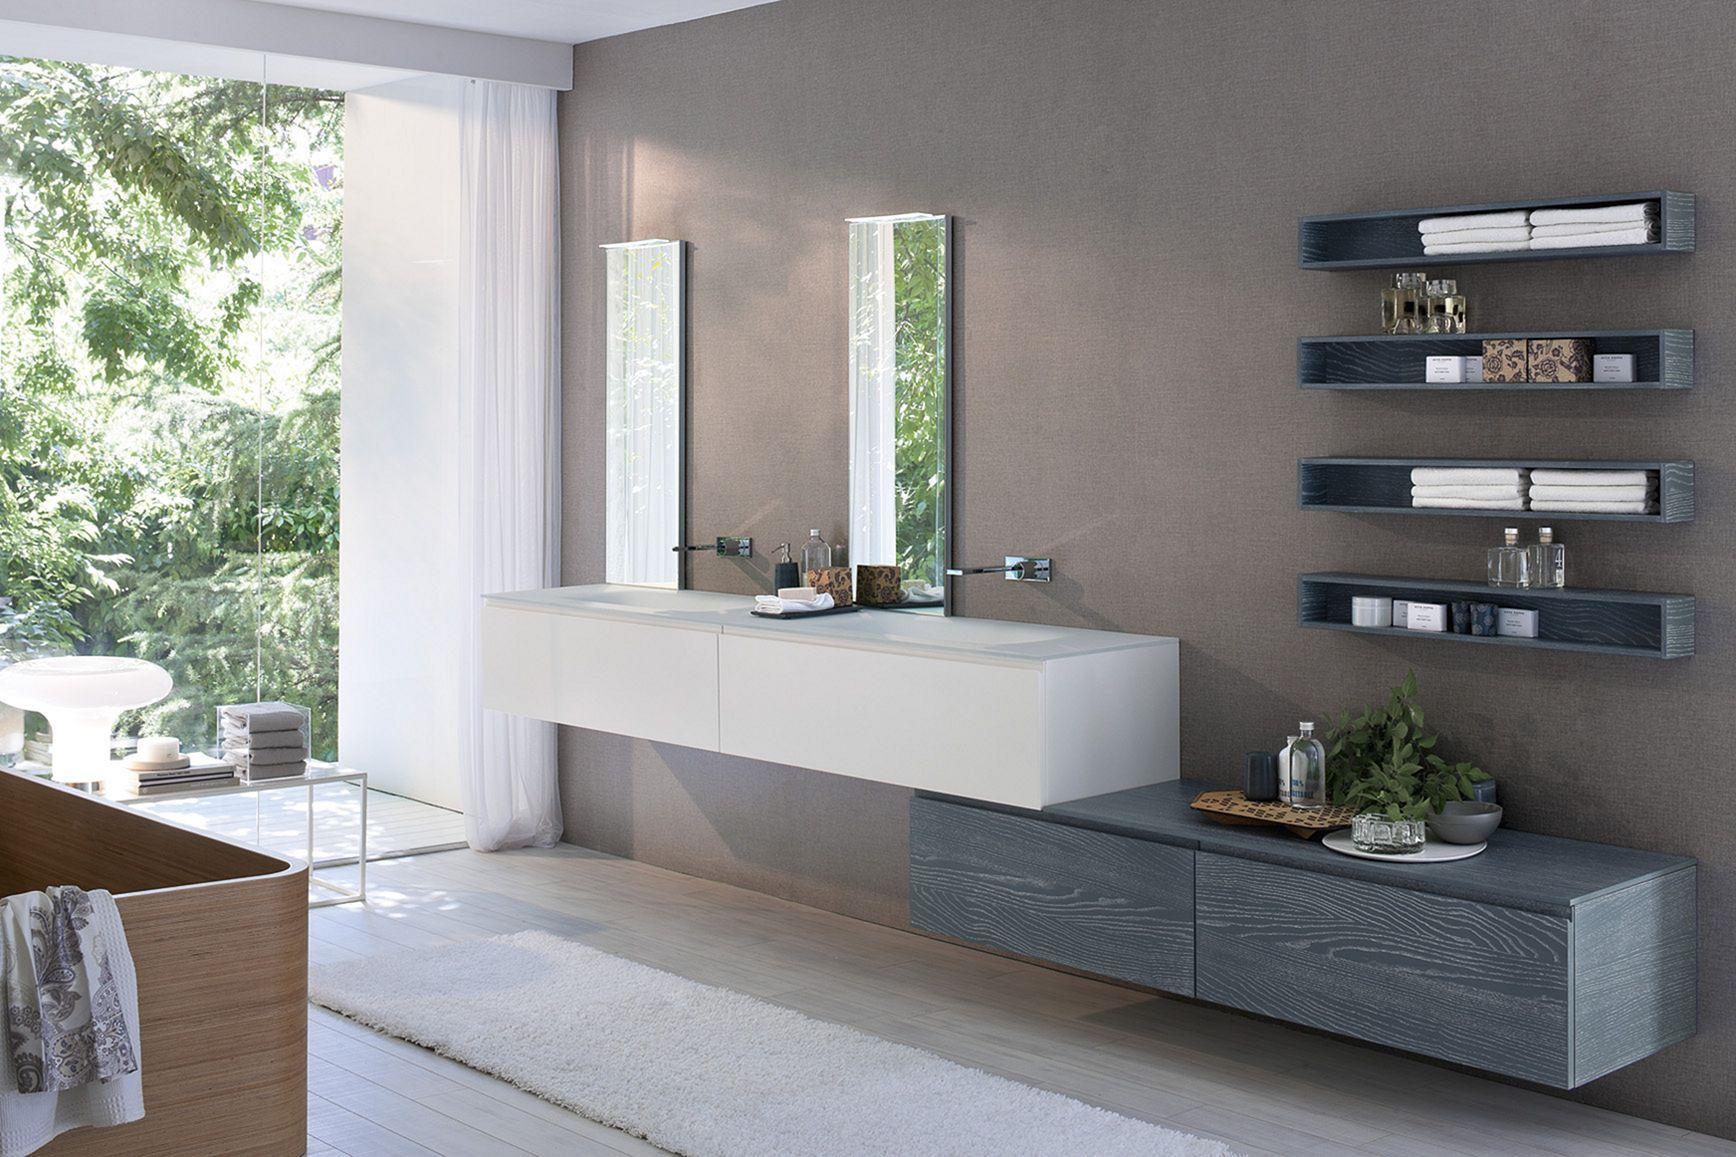 20 Incredible Bathroom Furniture Design Ideas For Those Who Love Beauty Bathroom Furniture Design Modern Bathroom Design Bespoke Bathroom Bathroom furniture design ideas